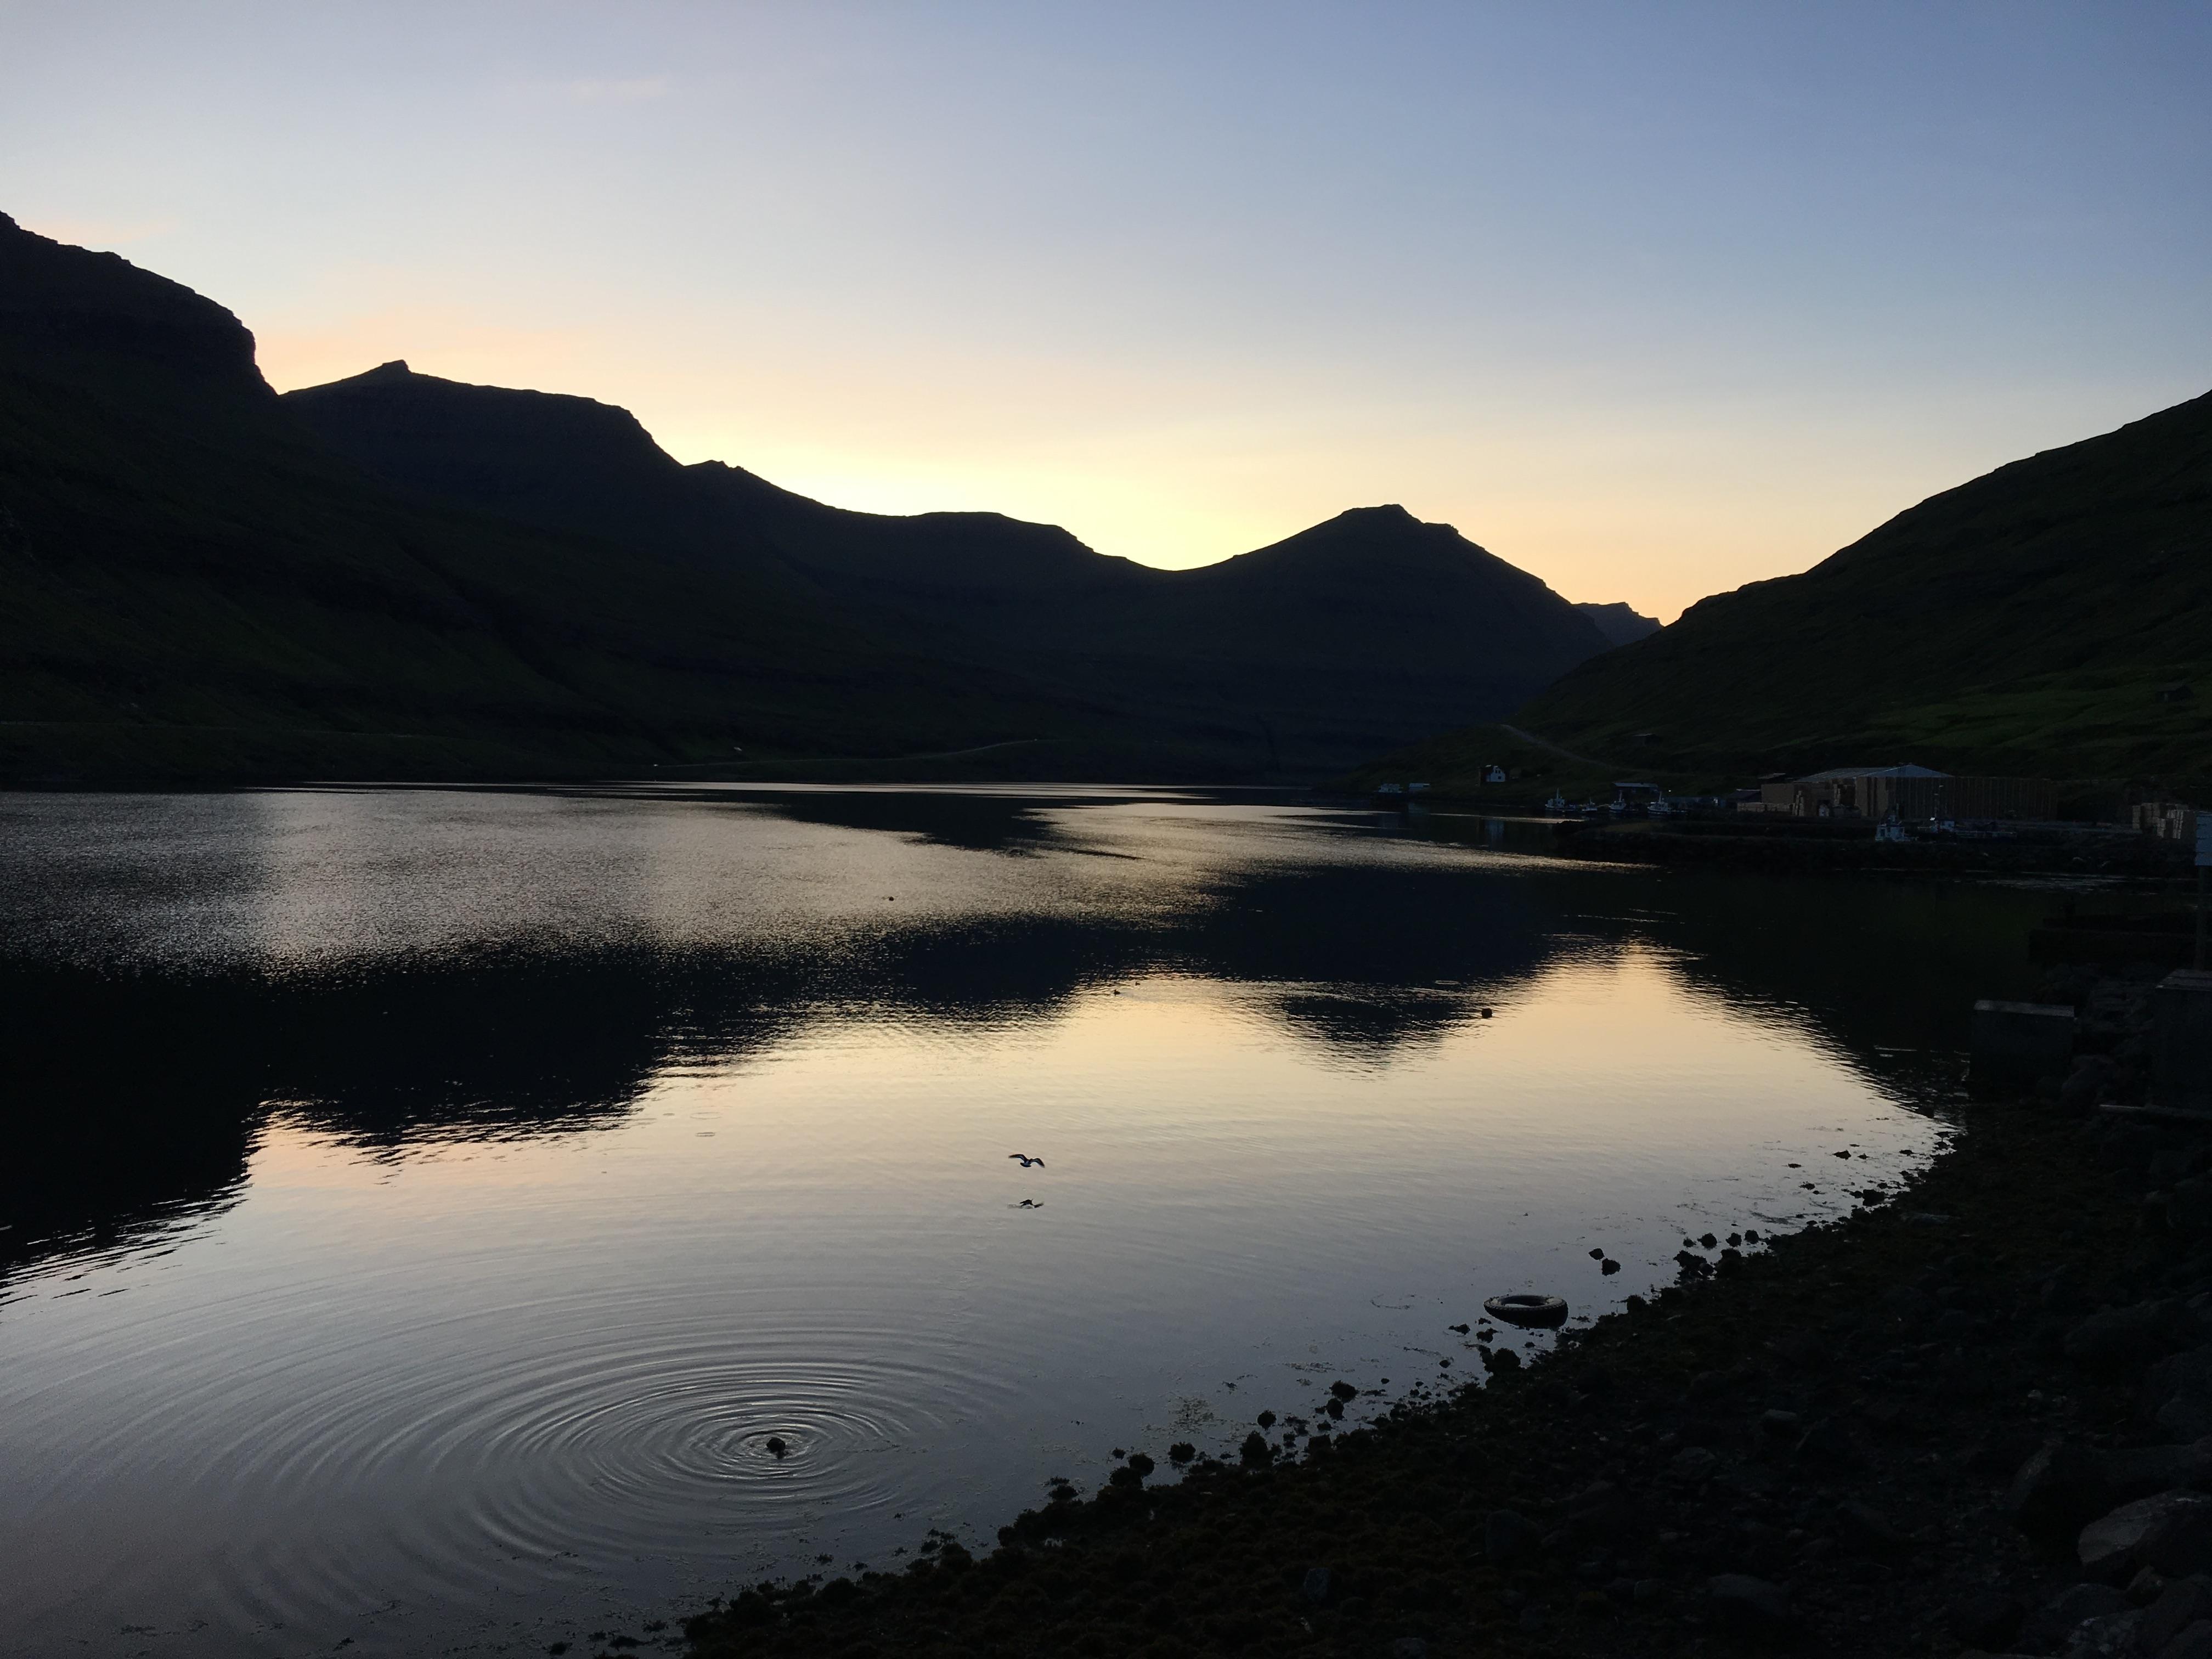 Funningsfjørður, Faroe Islands, in August at 10pm